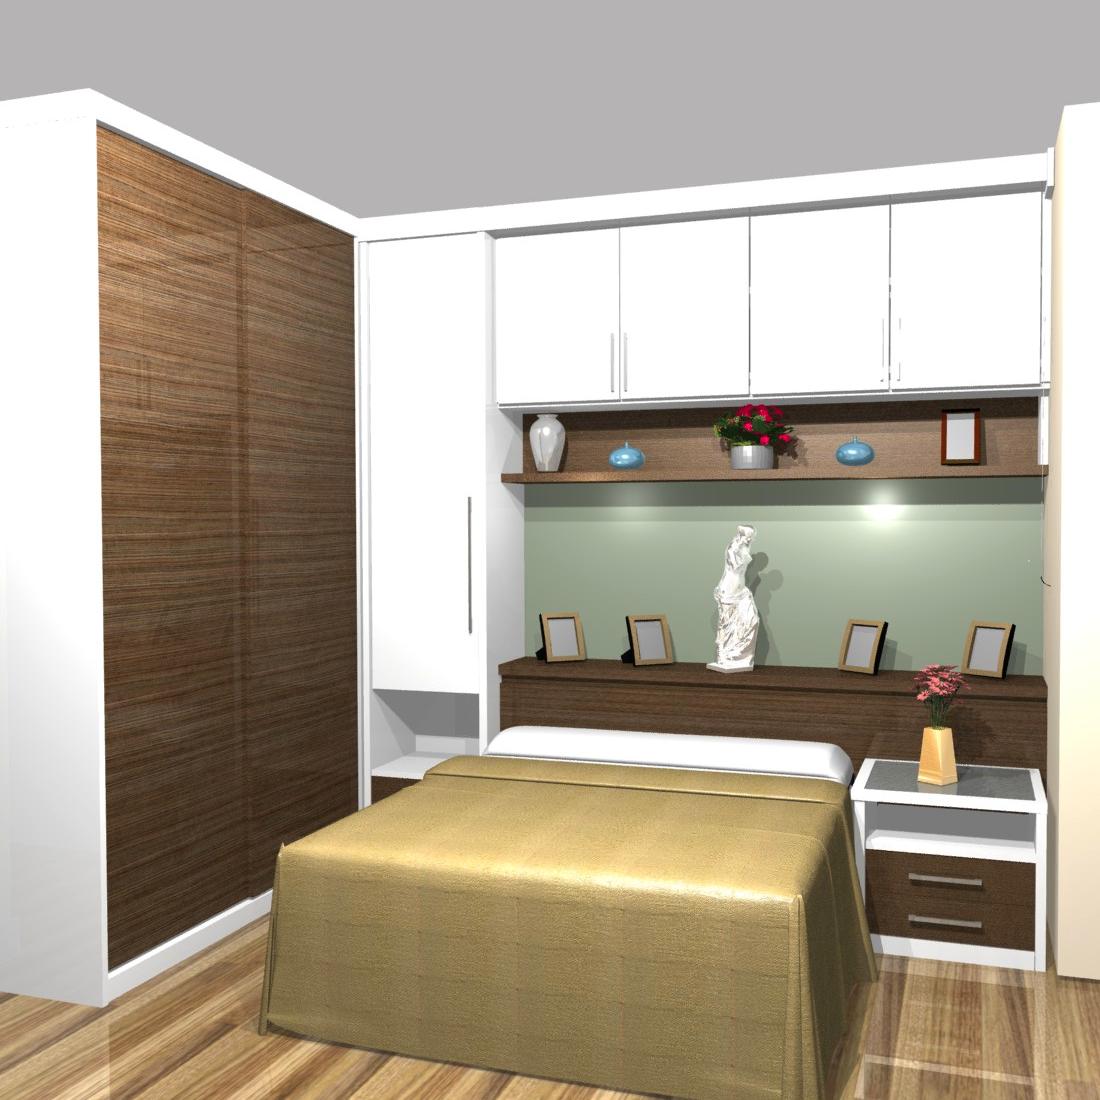 Bedroom with tv and closet - Armarios Planejados Quarto Bebe Moveis Para Loja Painel